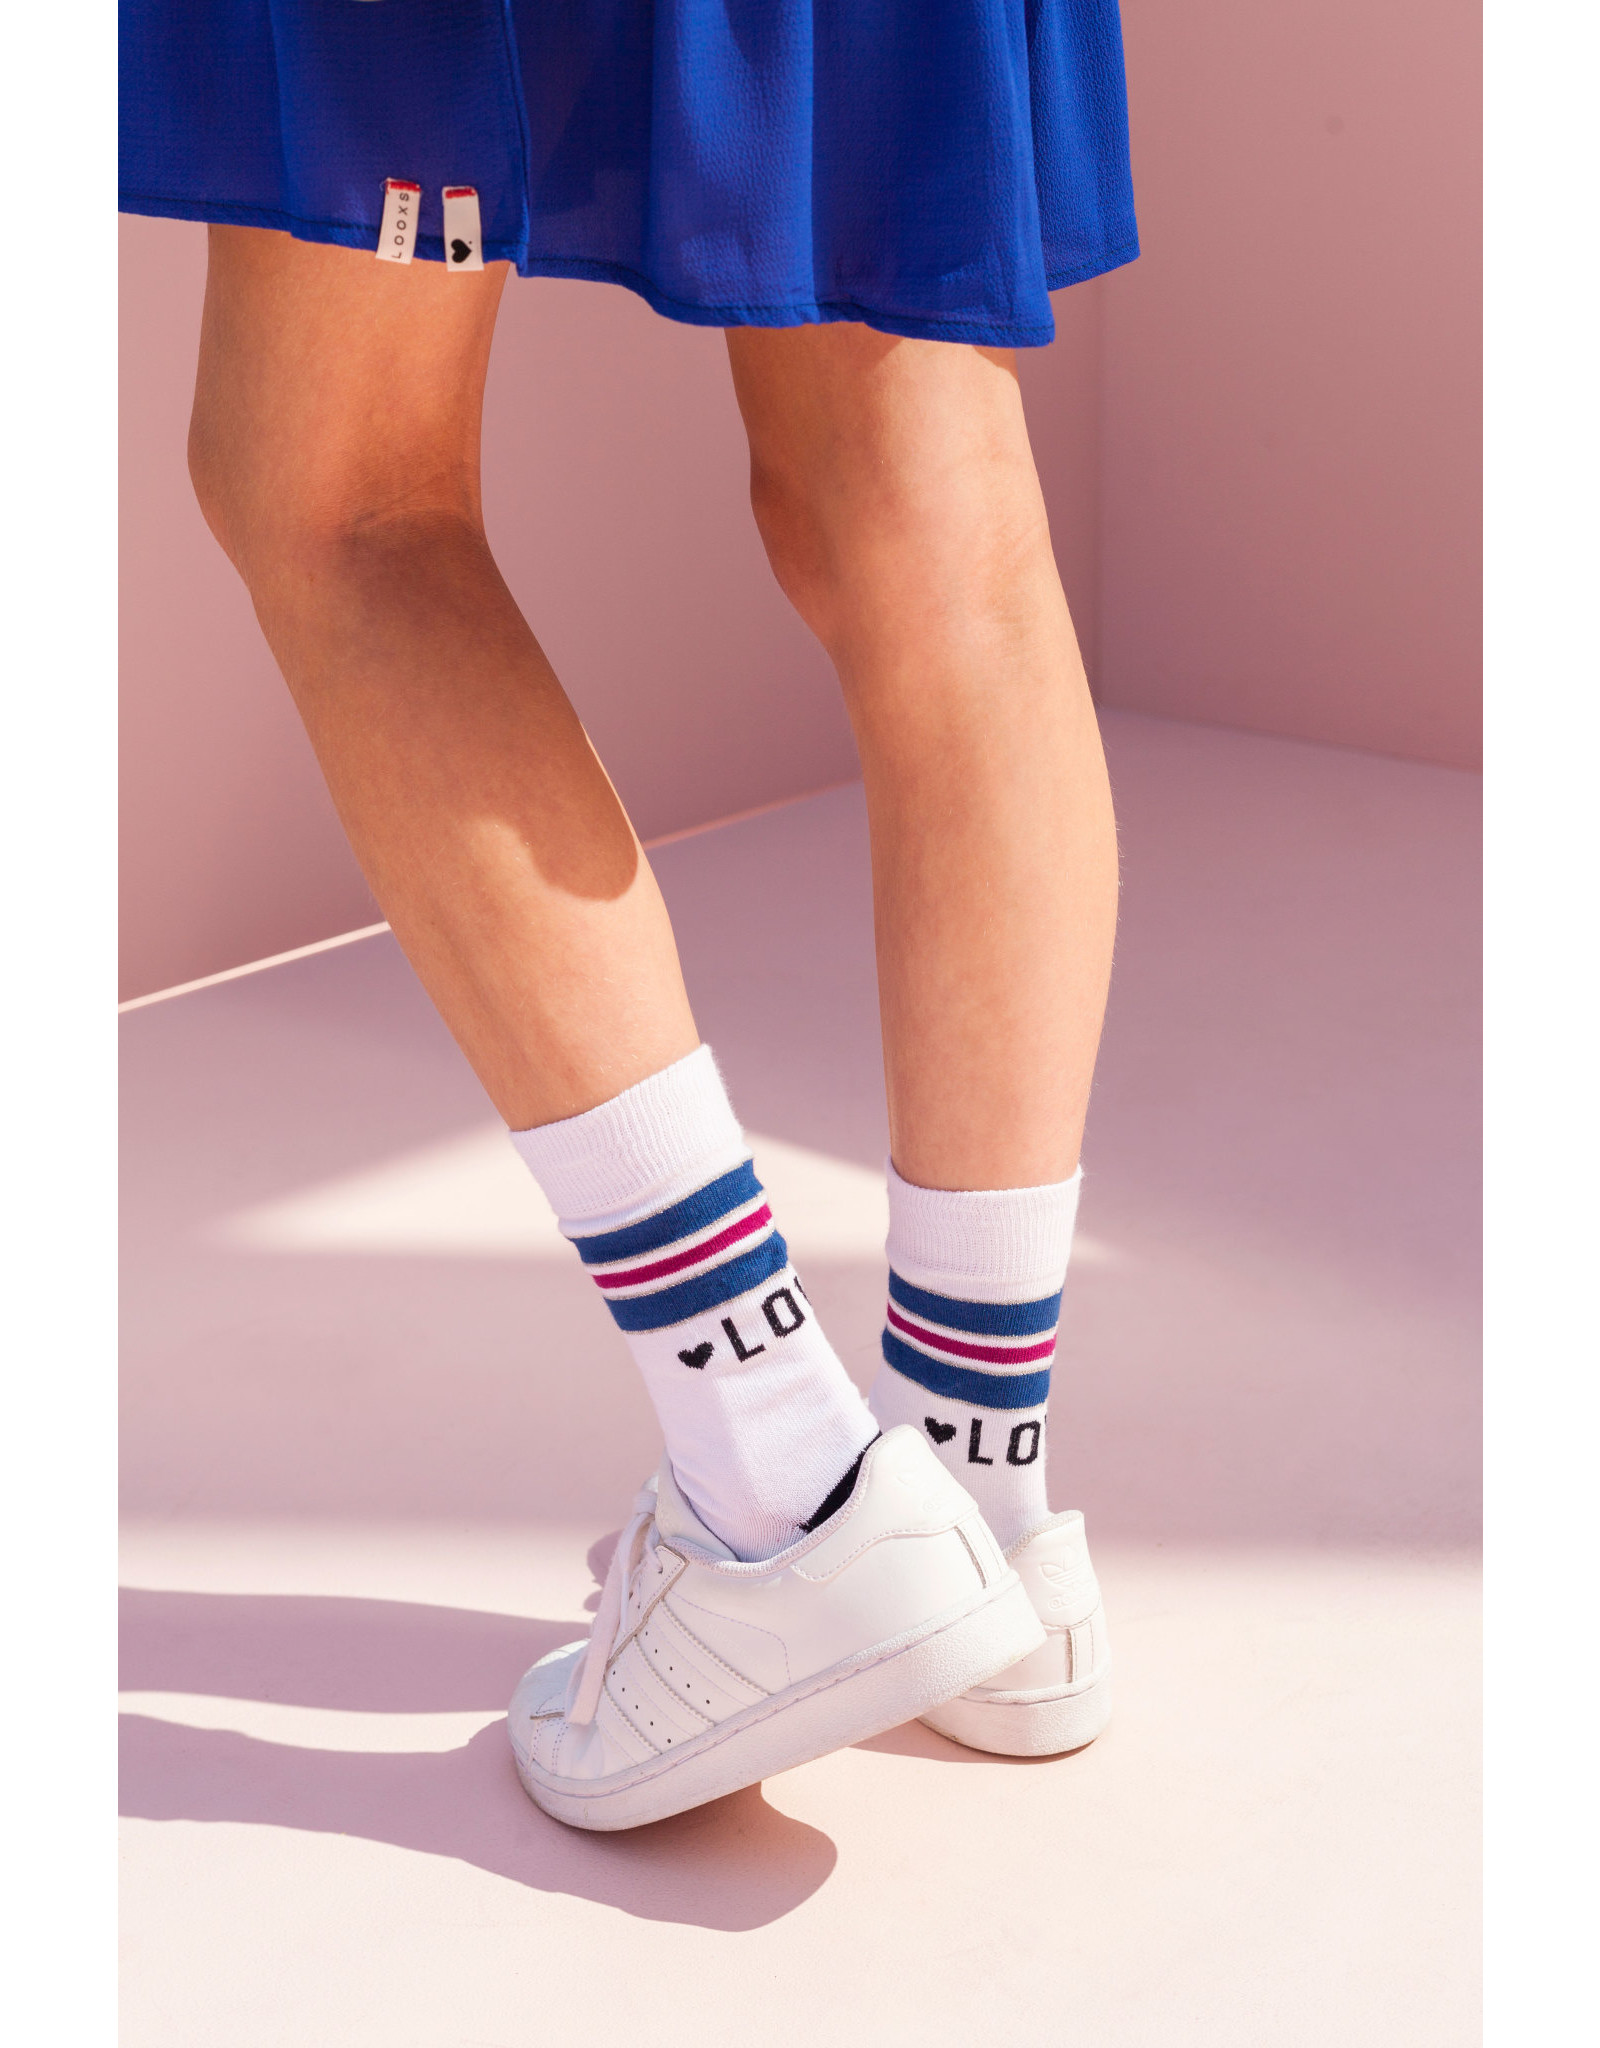 Looxs Girls socks off white